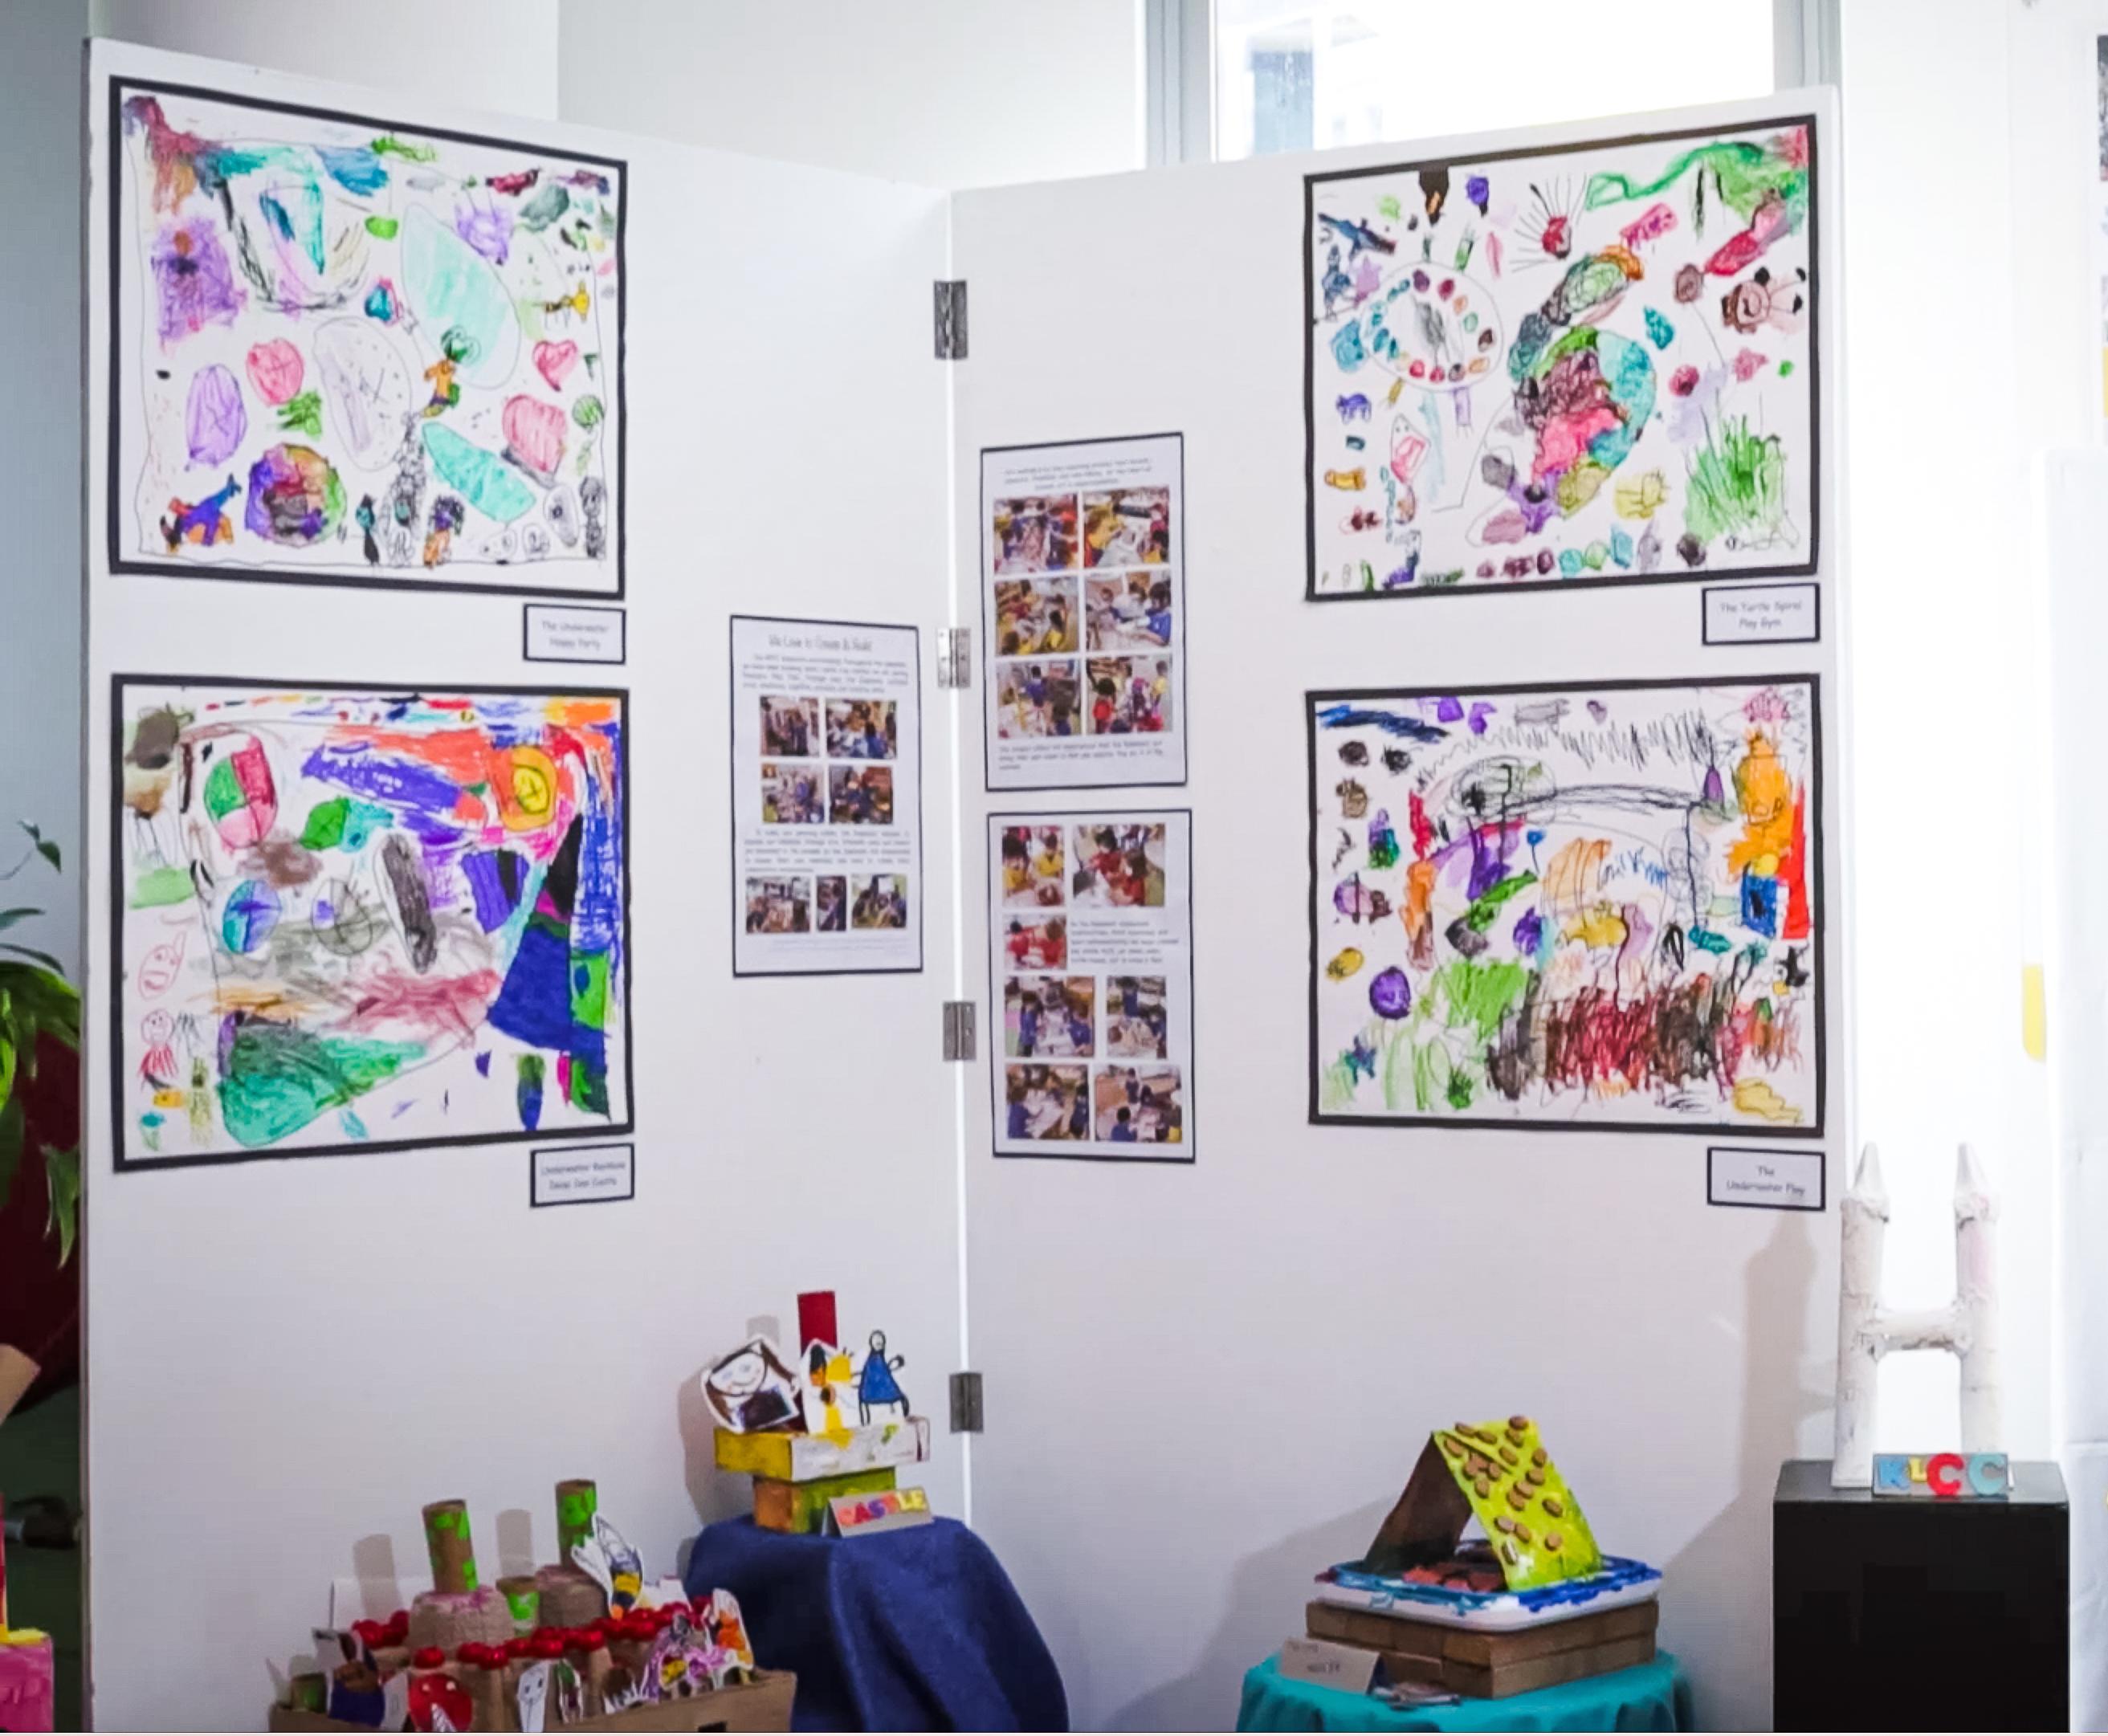 The International School of Kuala Lumpur (ISKL) Preschool